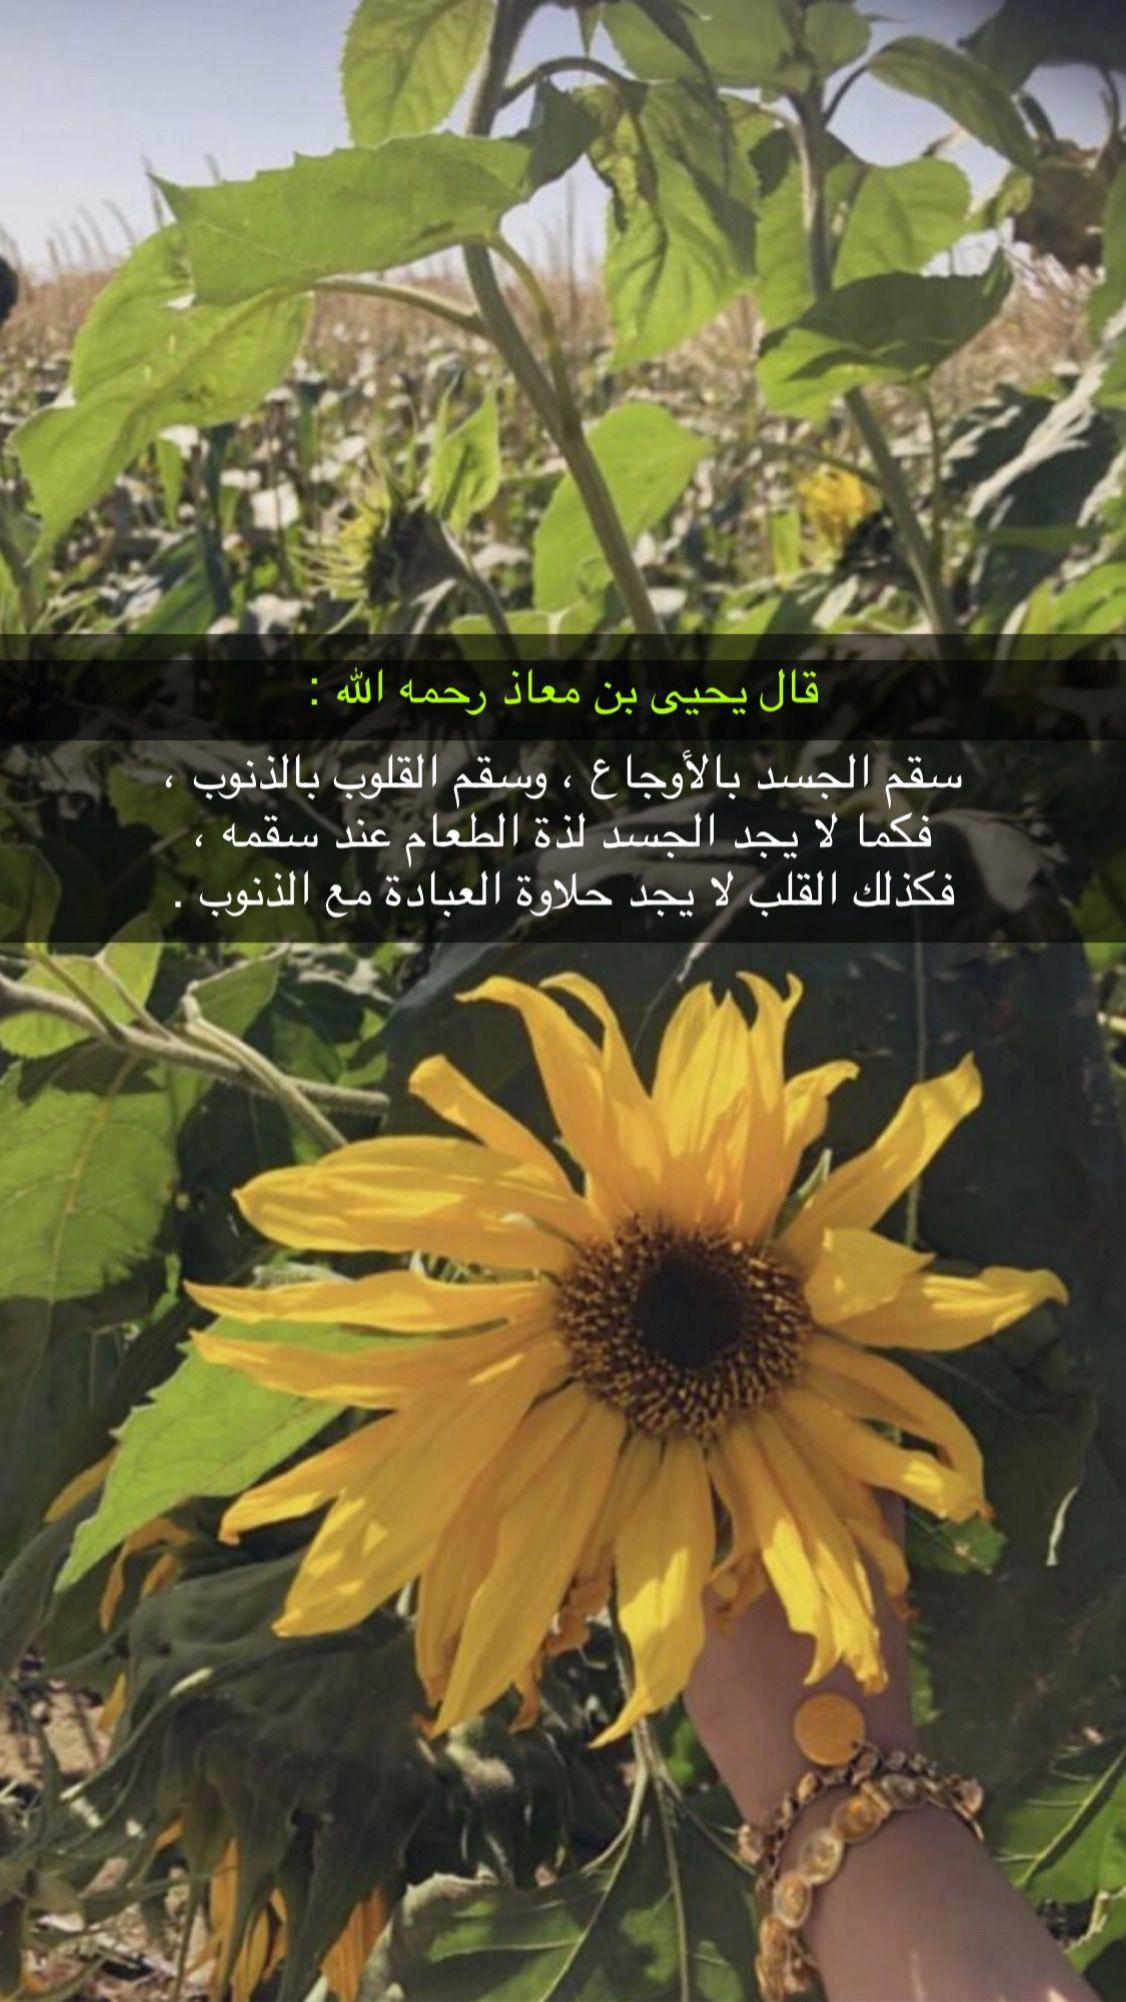 Pin By الوتين On خلفيات دينية Photo Plants Quotes